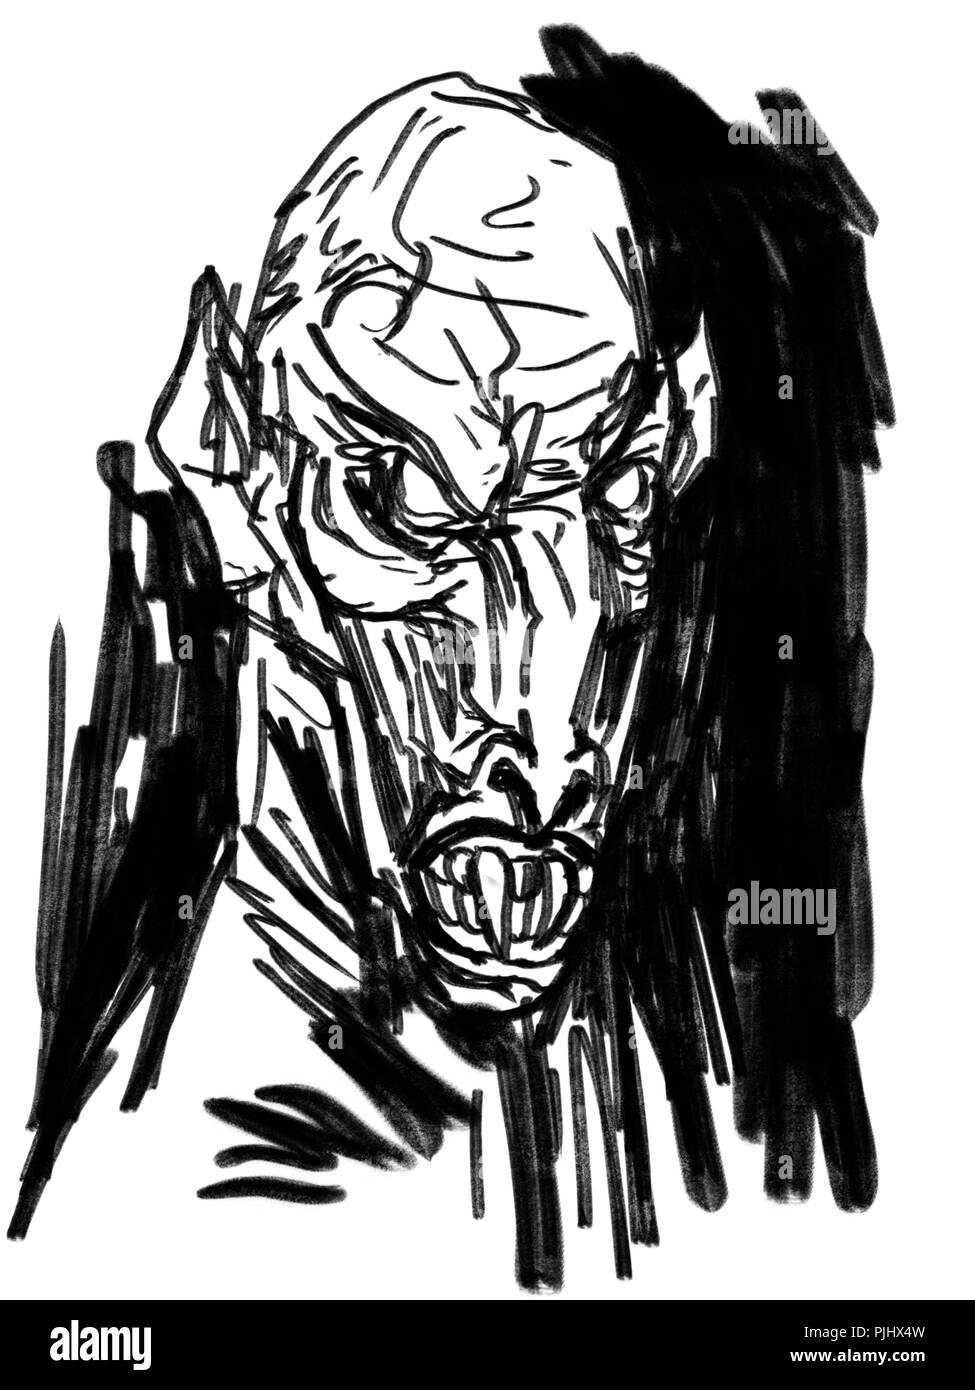 evil vampire illustration - Stock Image